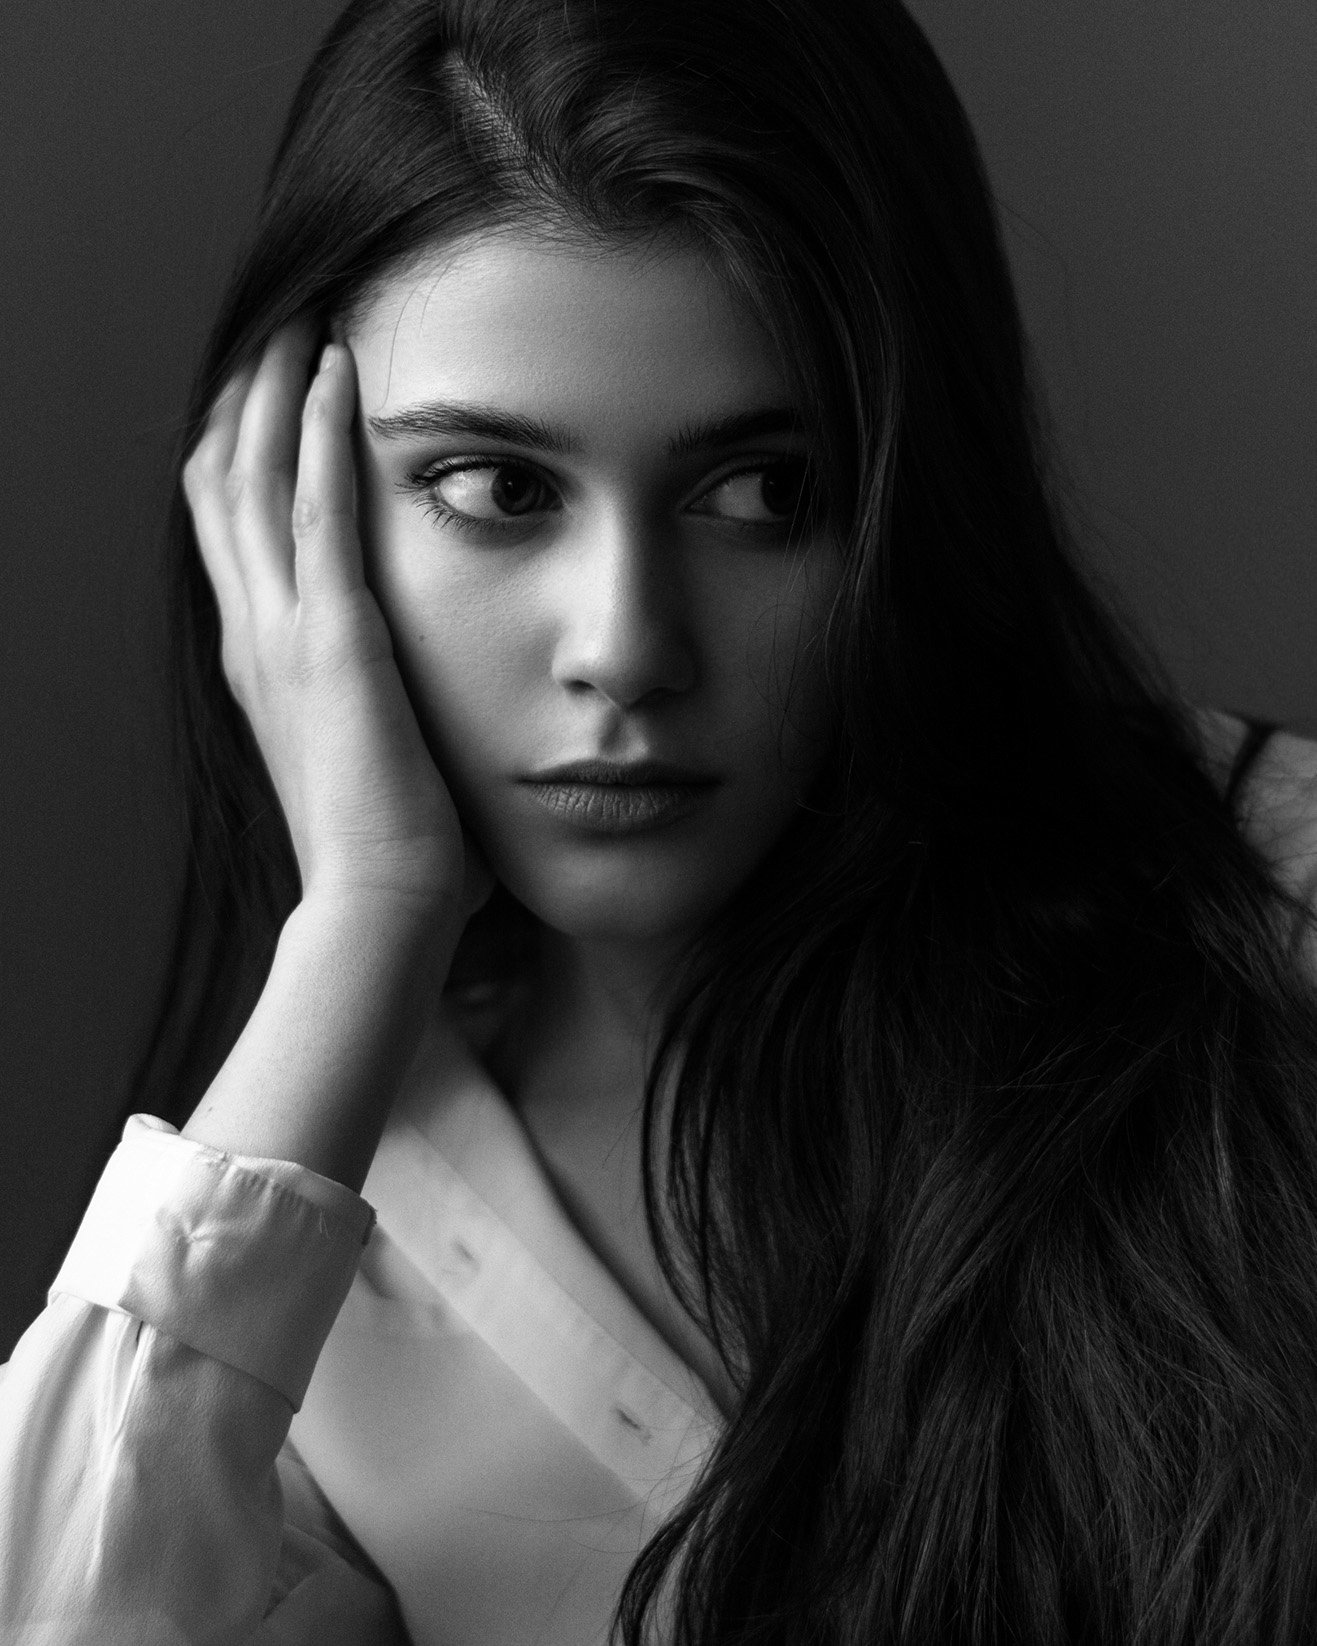 portrait photography portraits bnw black and white, Костюченков Дмитрий